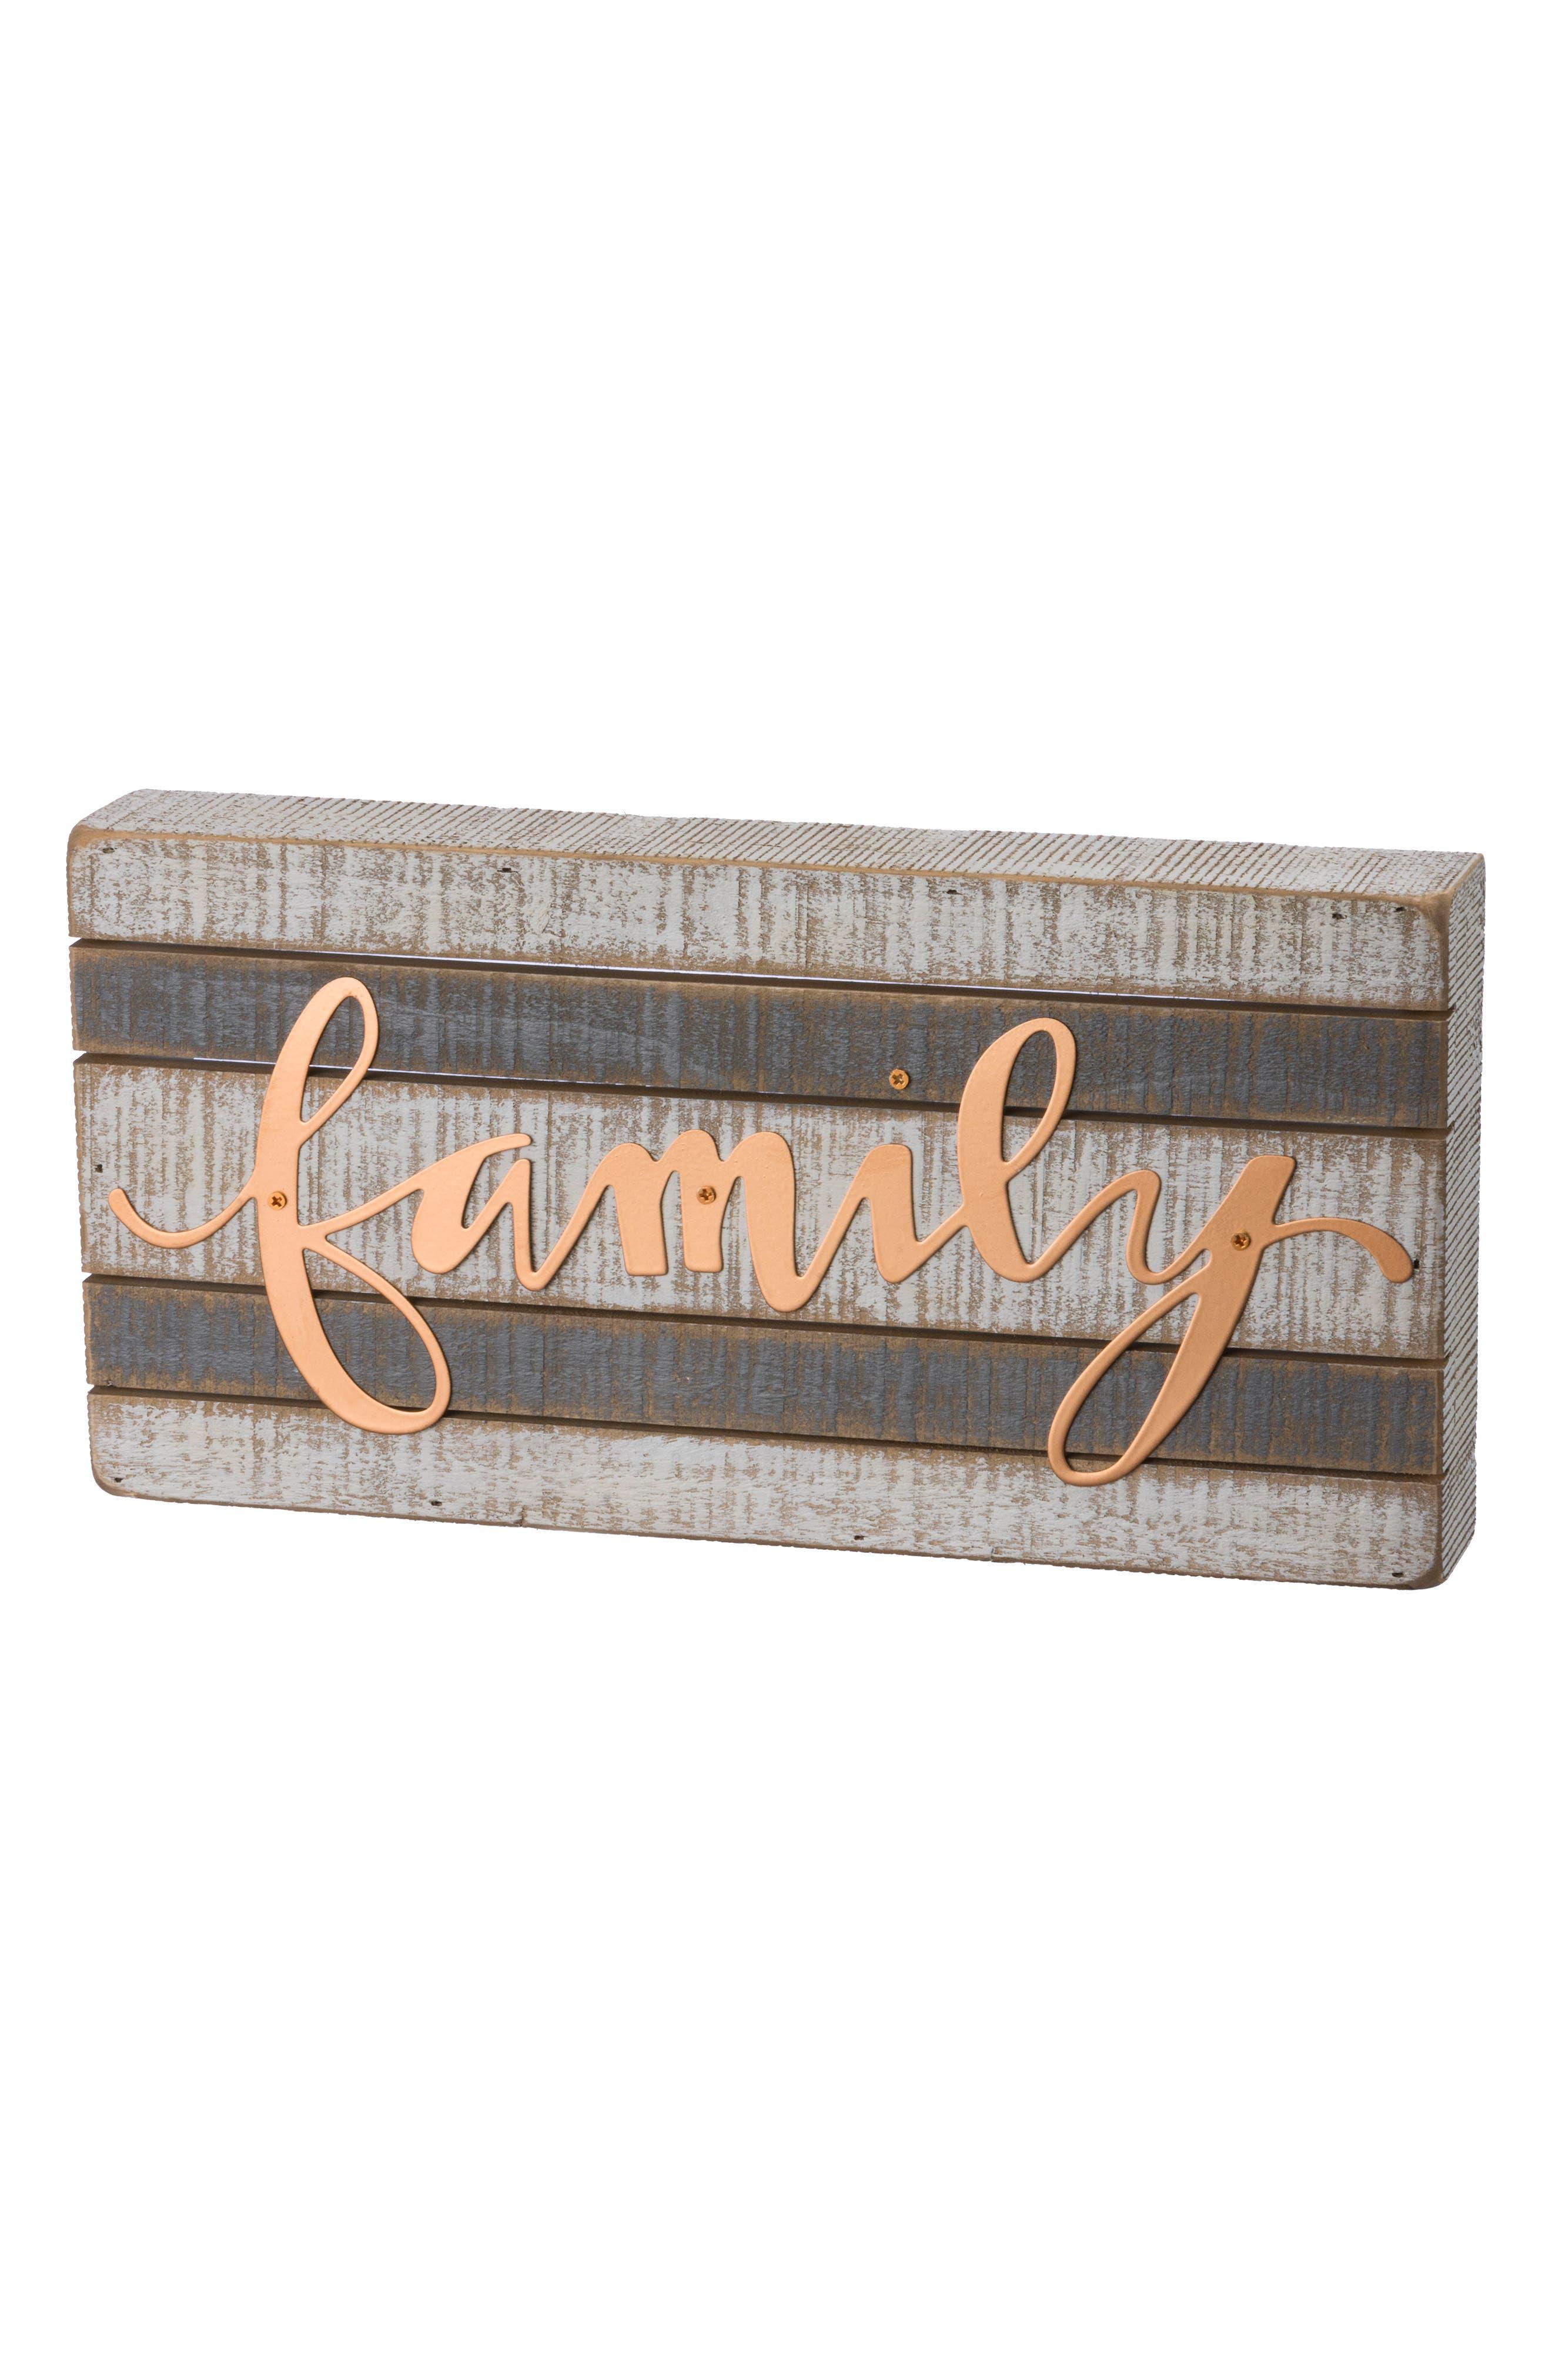 Main Image - Primitives by Kathy Family Wood Box Sign